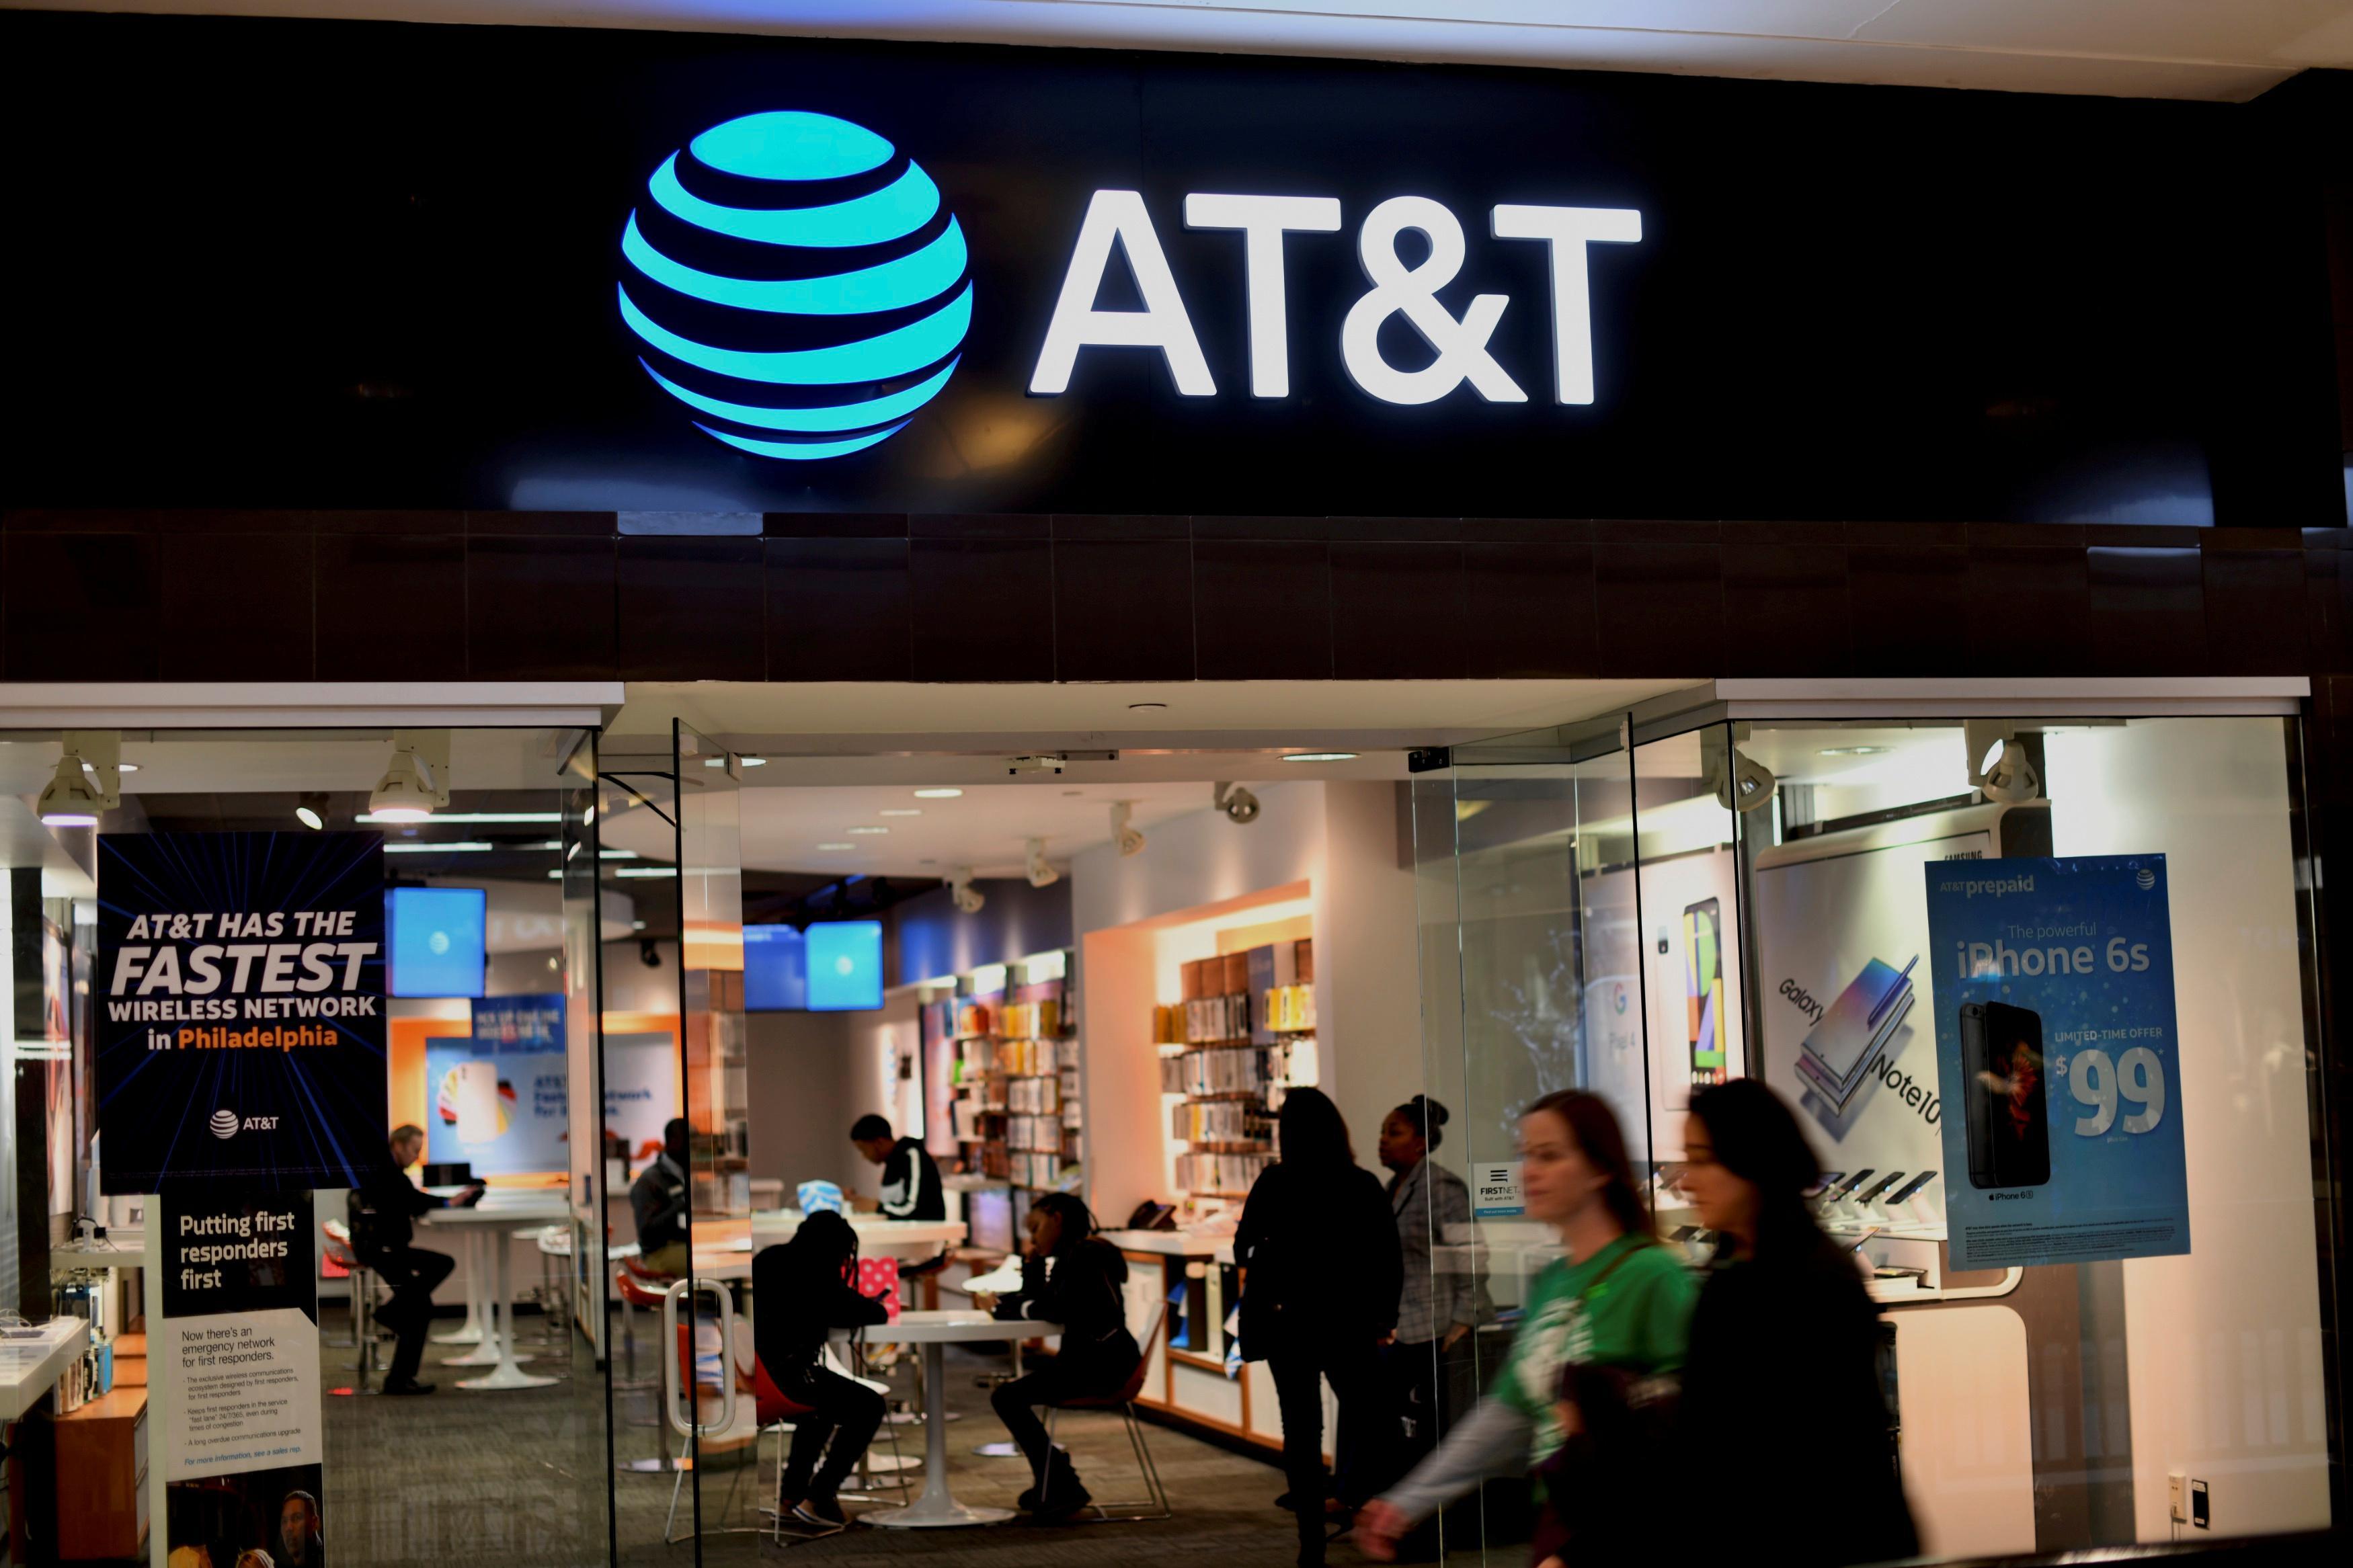 AT&T revenue falls short of estimates as satellite TV sheds...